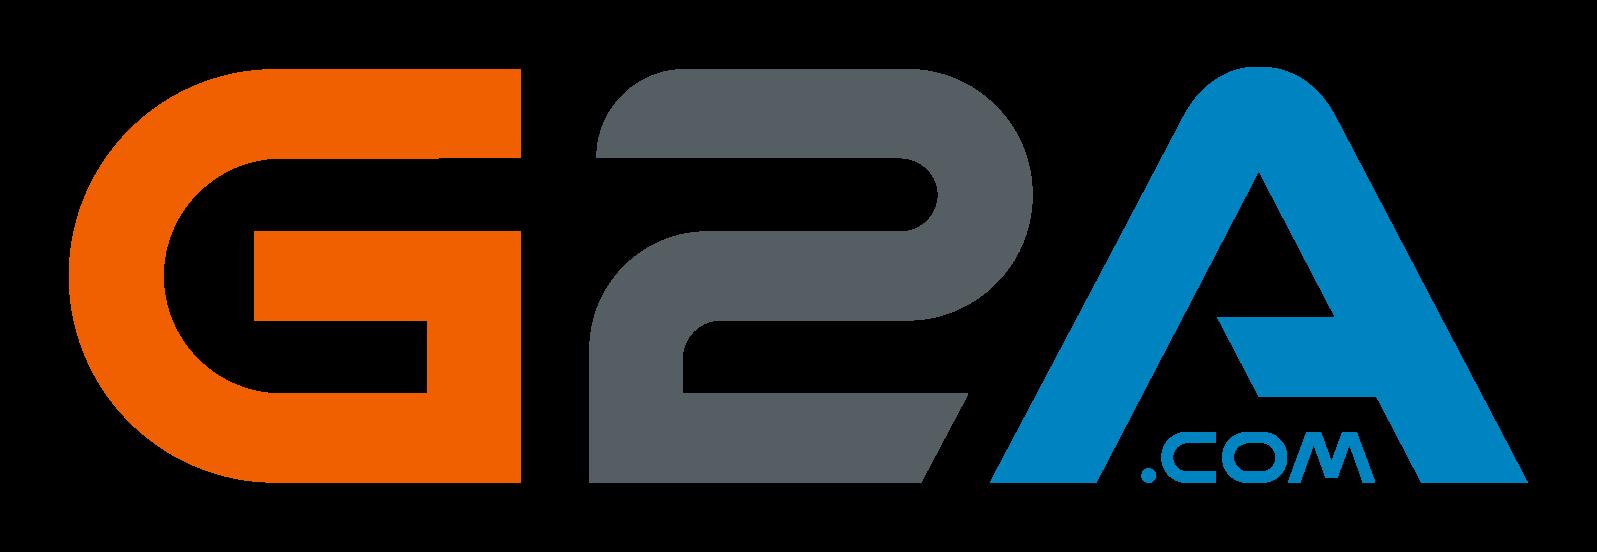 Kortingscode G2A